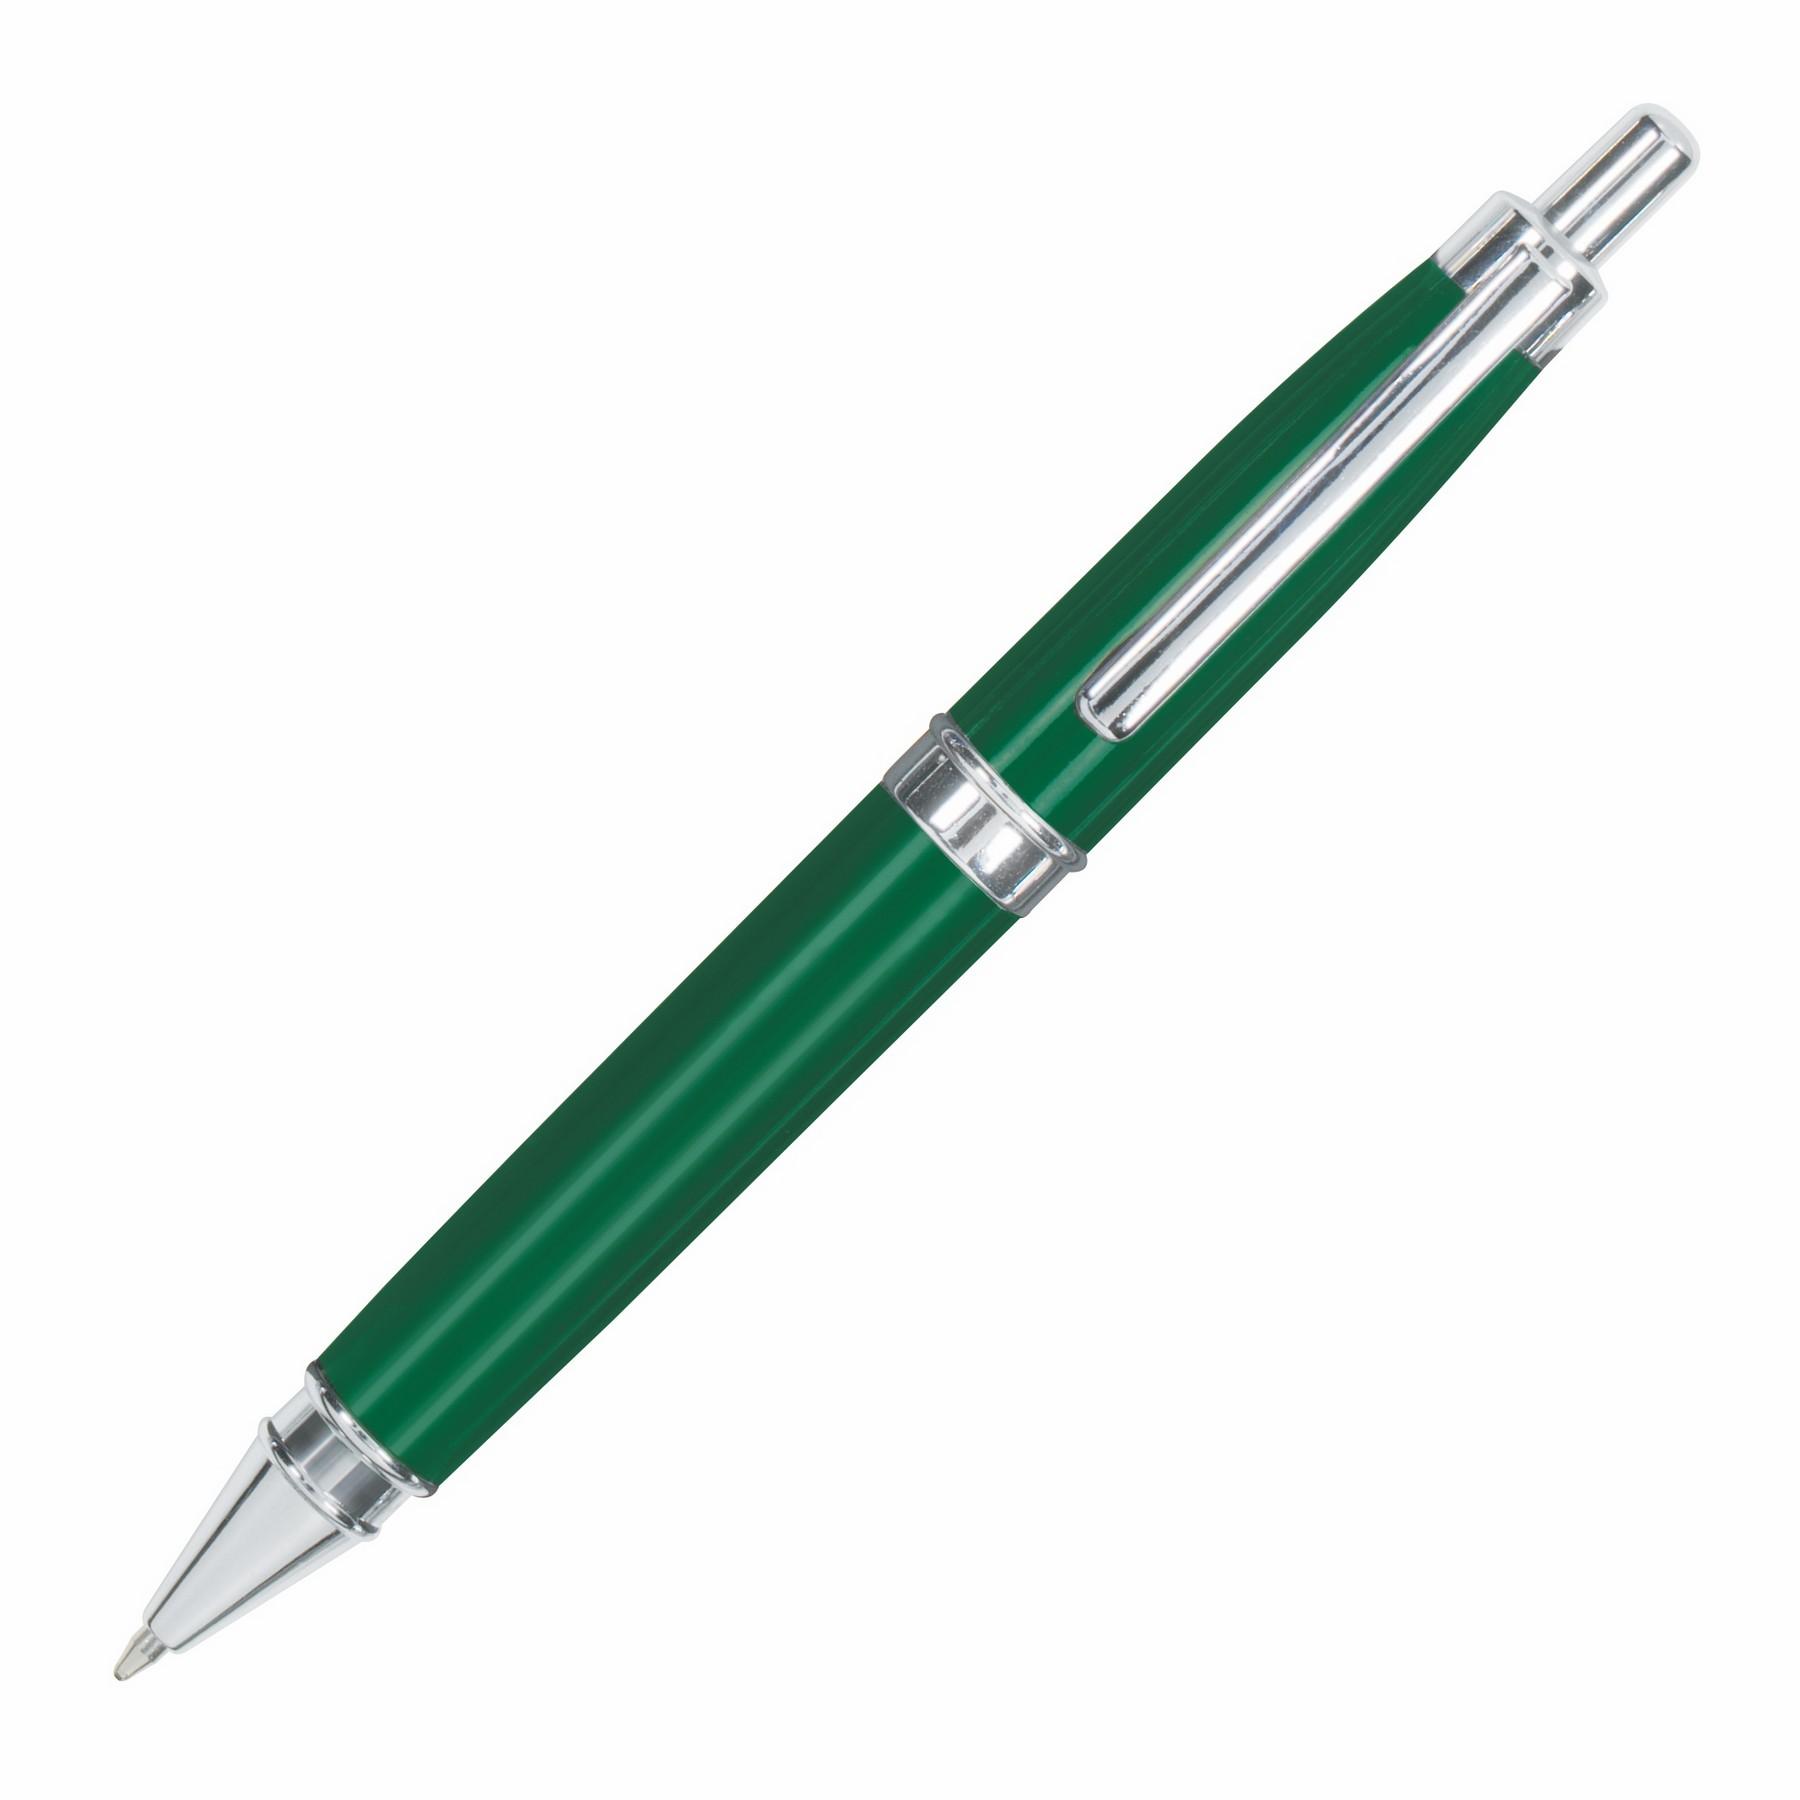 Dayton Hybrid Plunger Action Ballpoint Pen